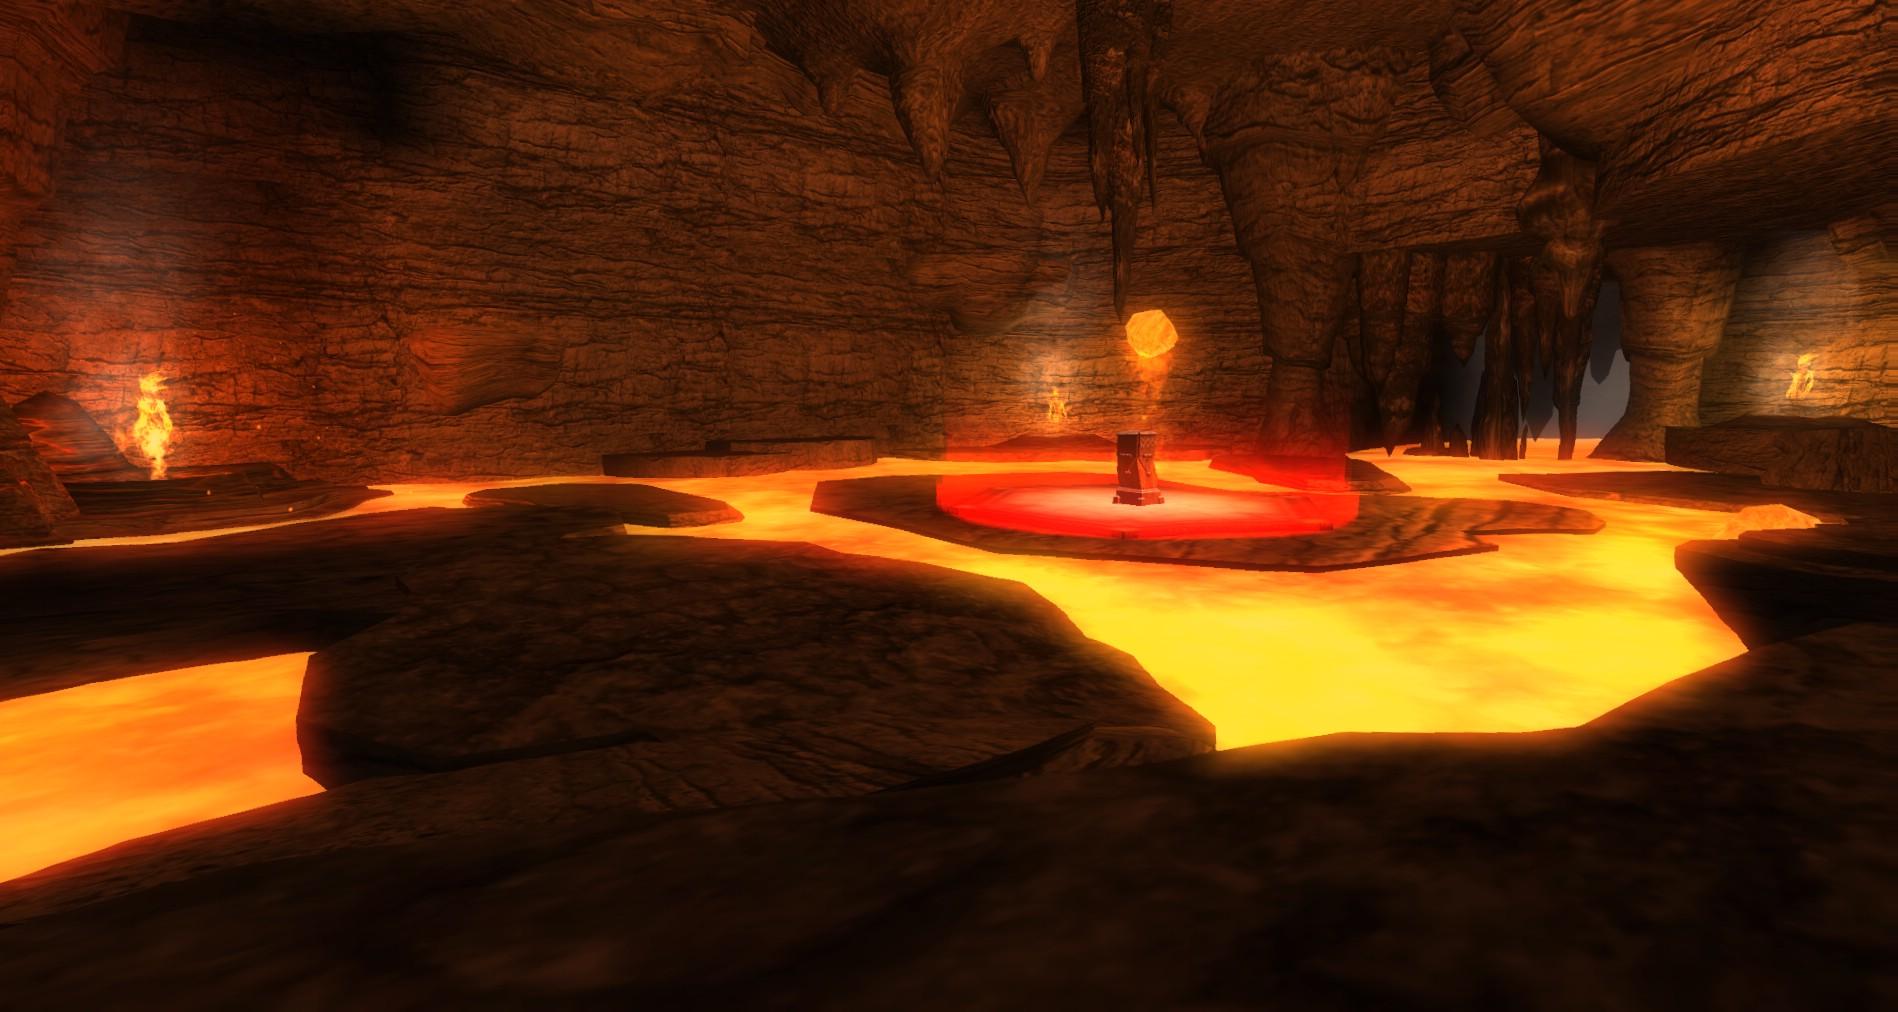 u10-lord-of-eyes-fire-elemental-room